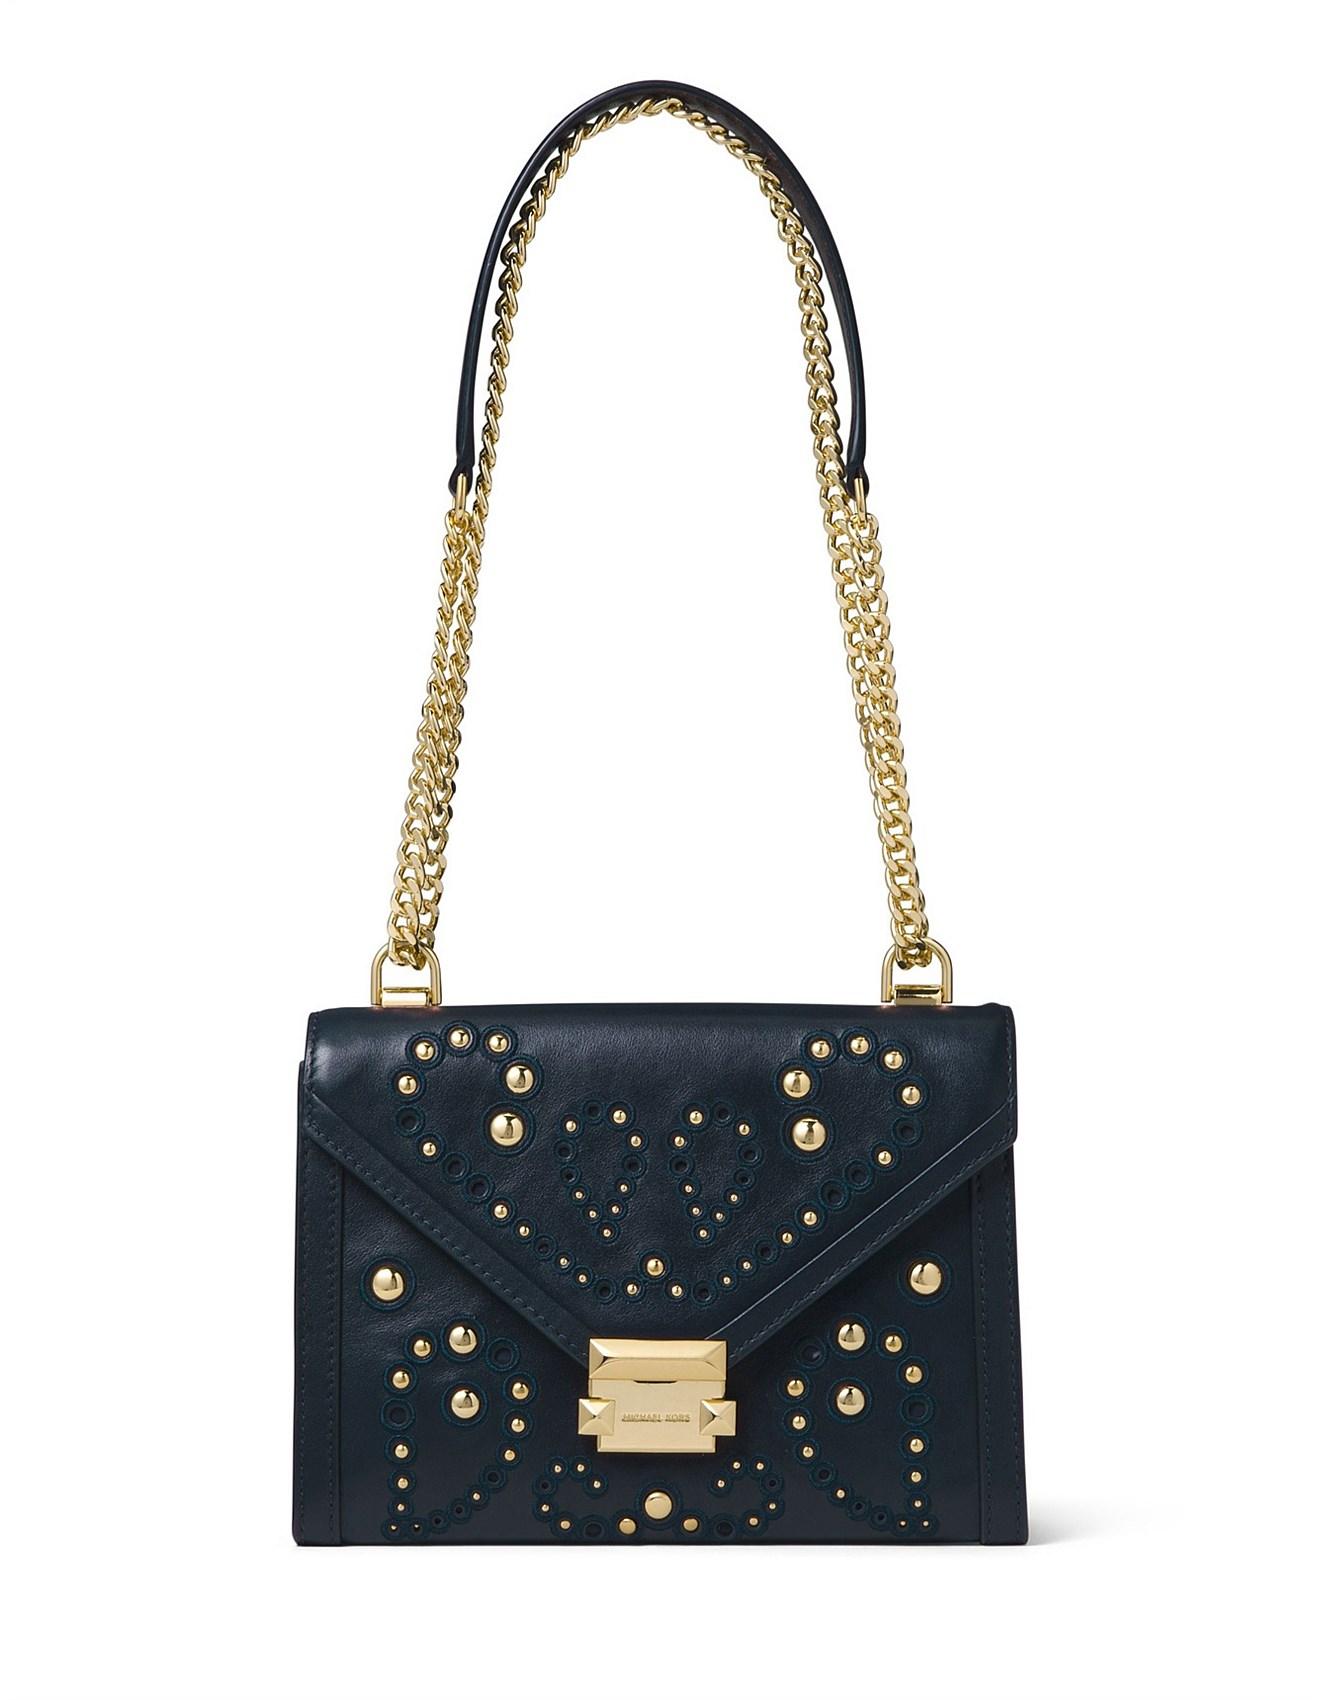 559437093eb4d6 Michael Kors   Handbags, Watches & More Online   David Jones ...